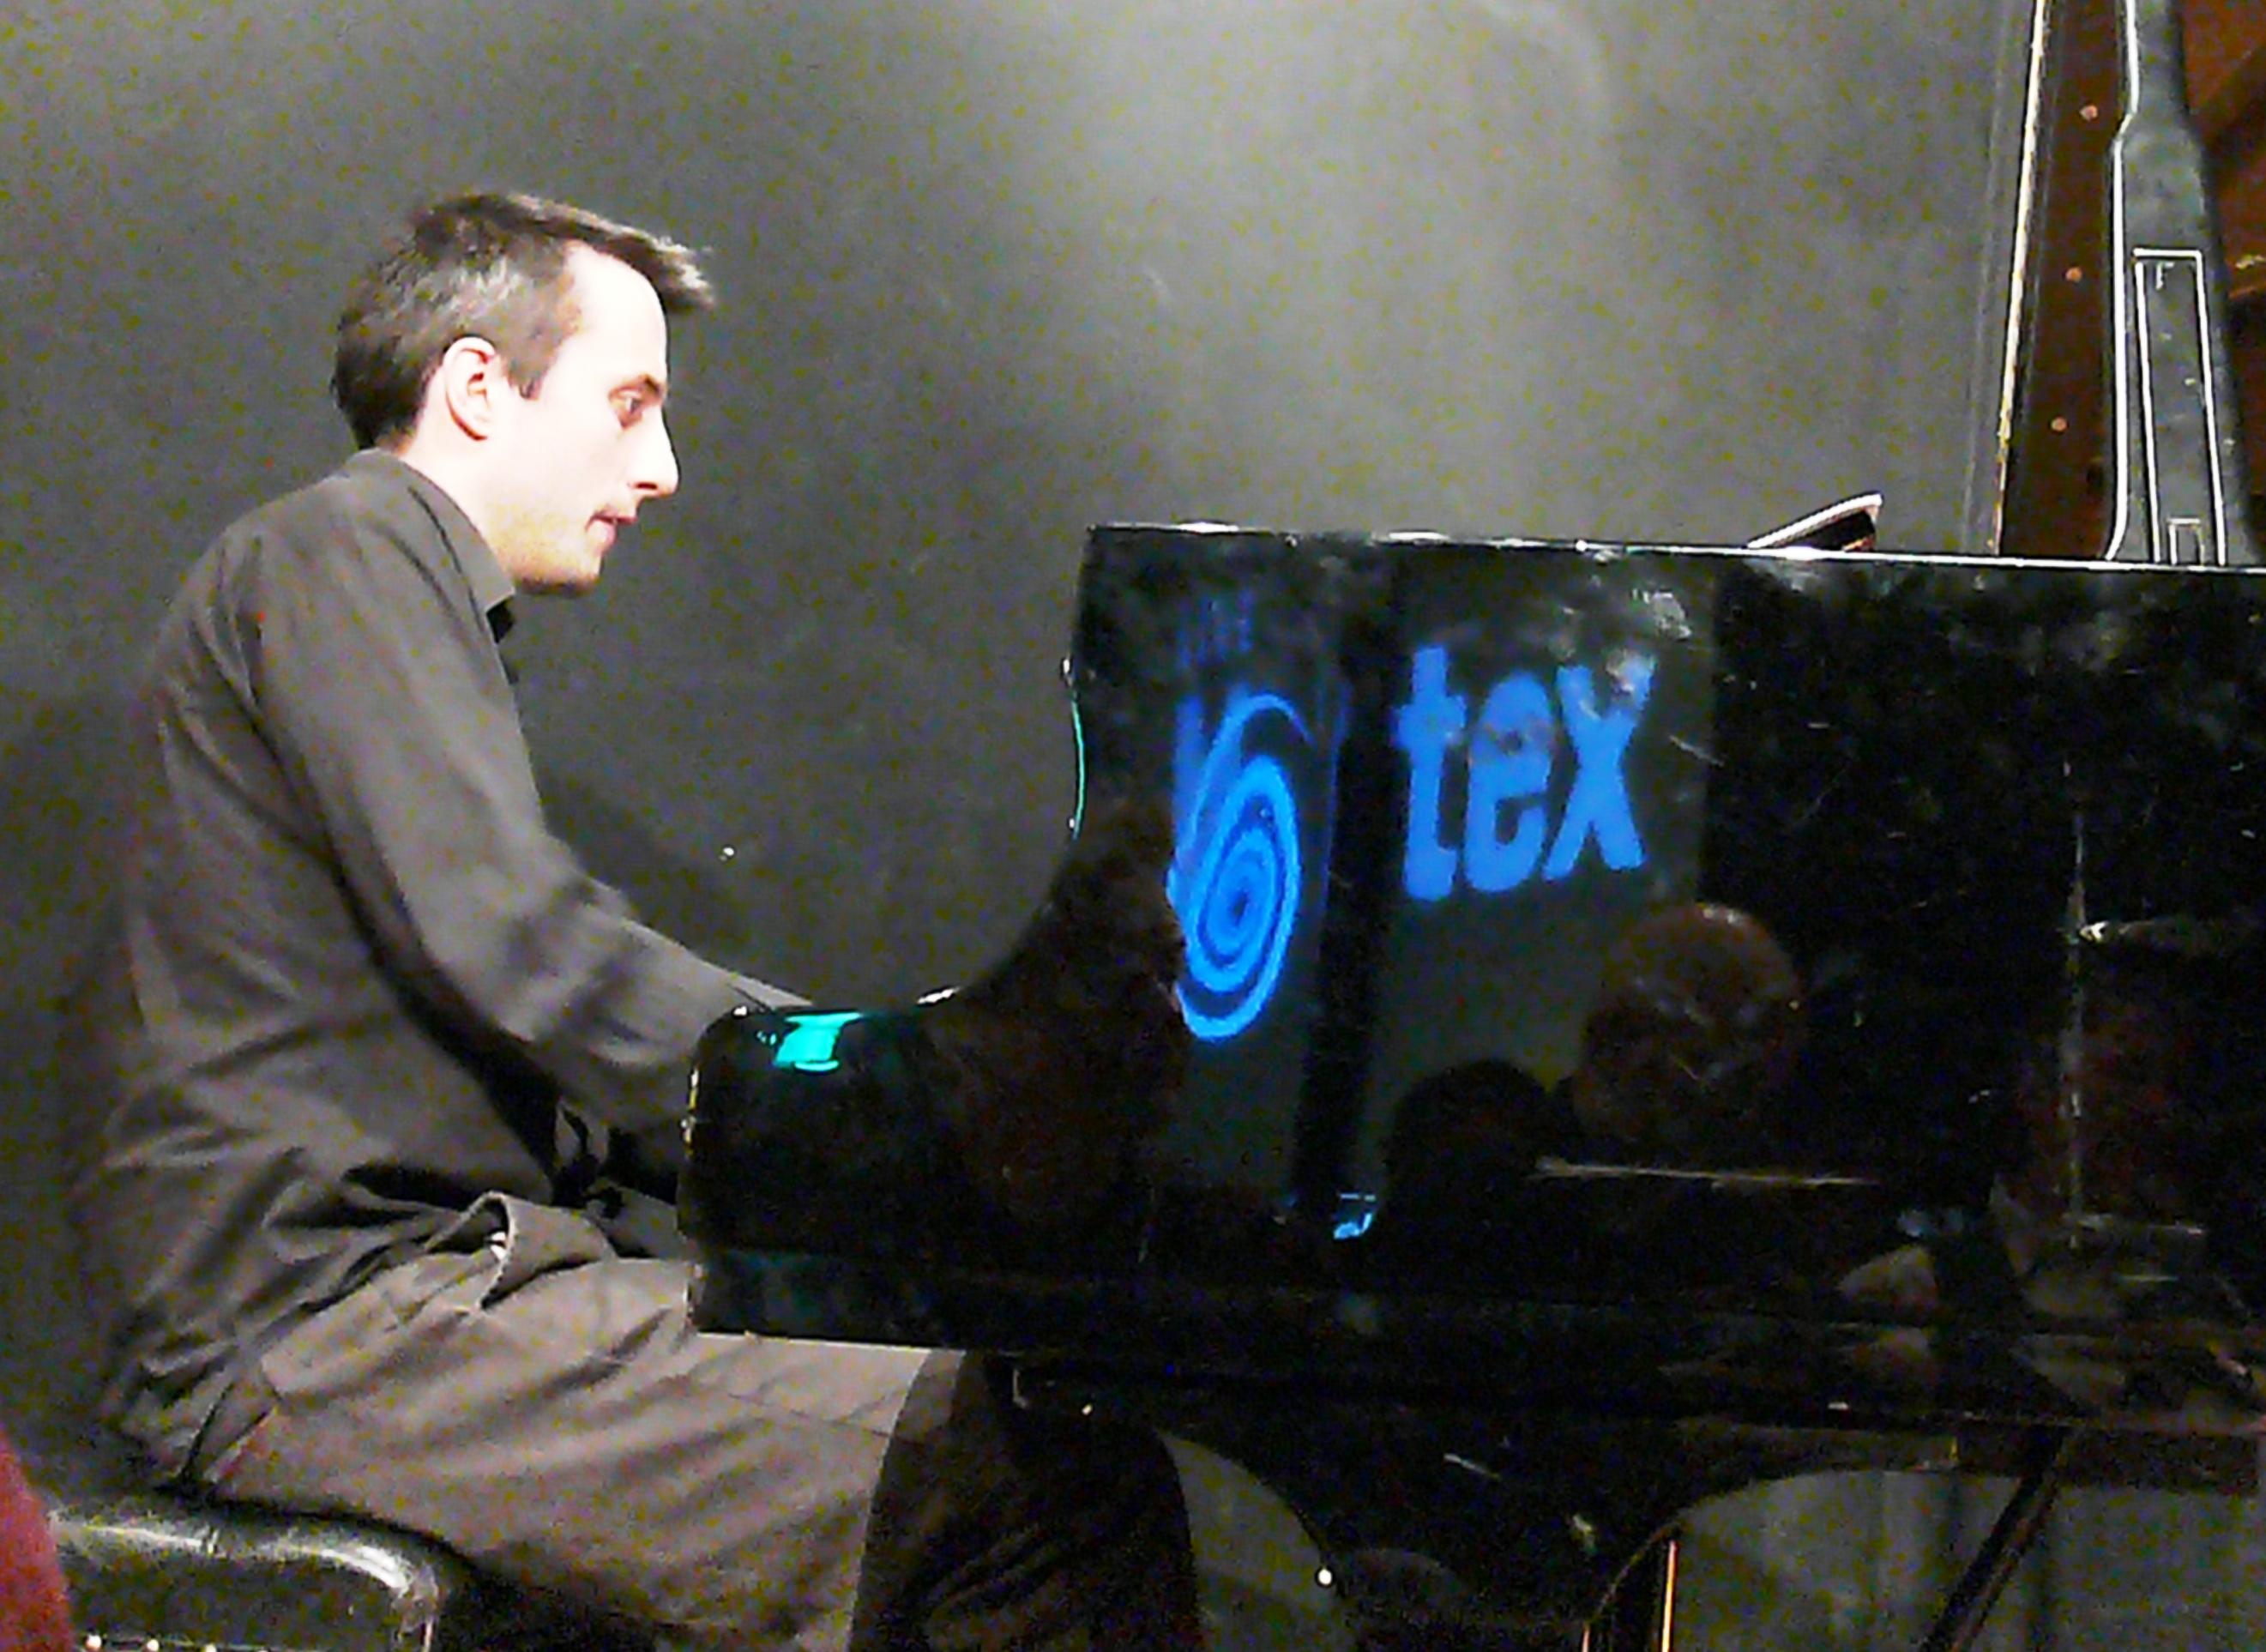 Alexander hawkins at the vortex, london in february 2013